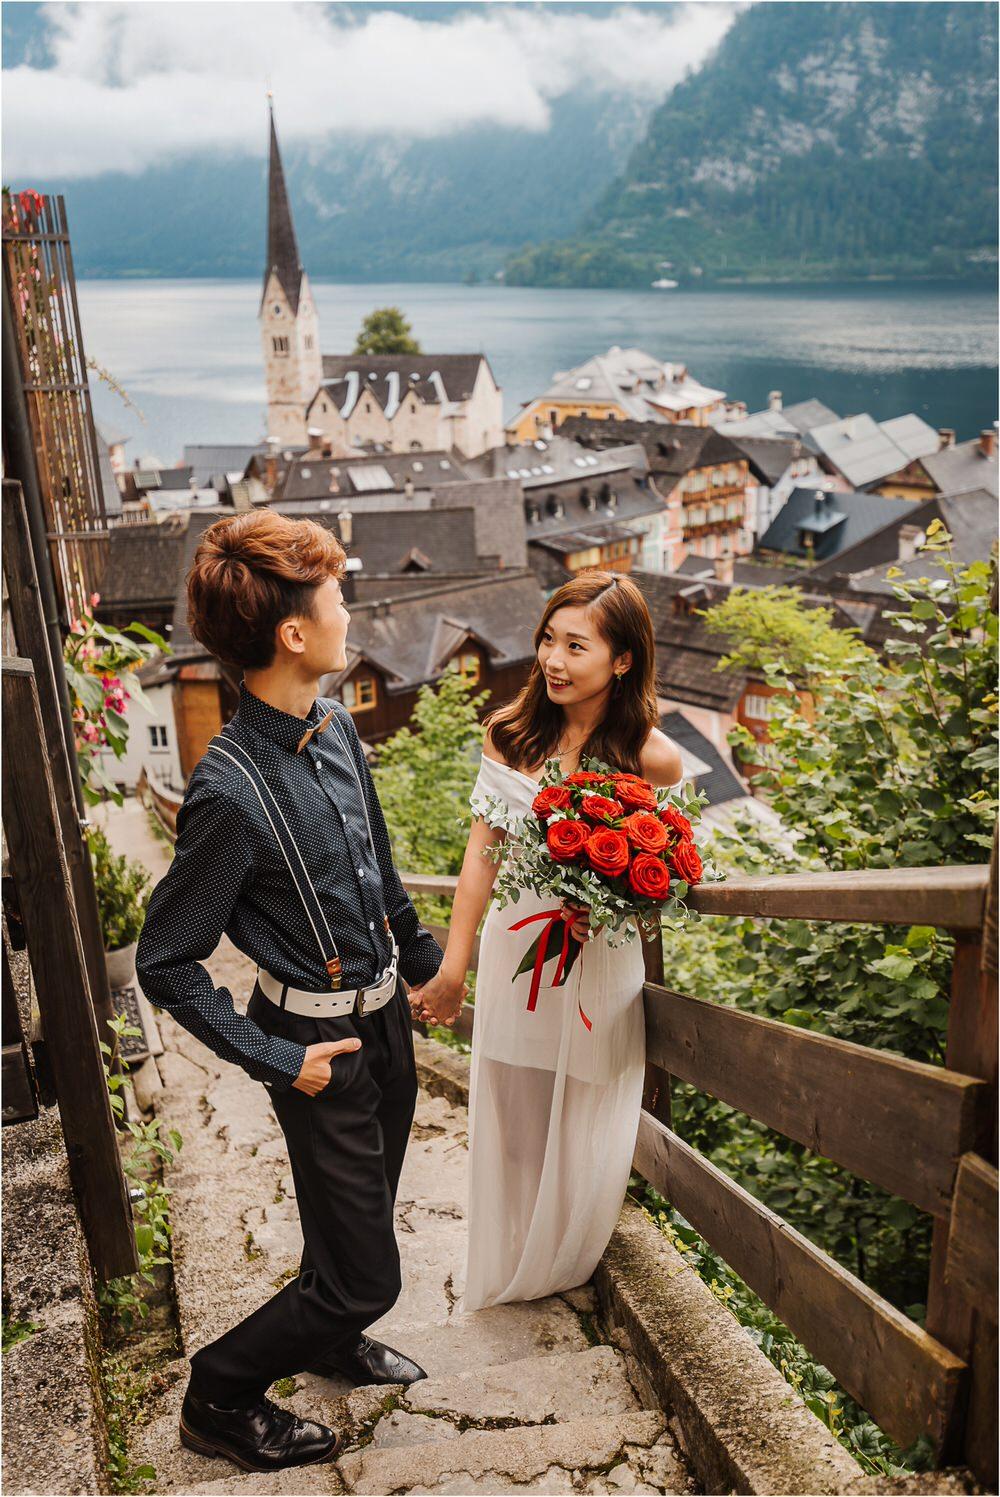 hallstatt austria wedding engagement photographer asian proposal surprise photography recommended nature professional 0018.jpg